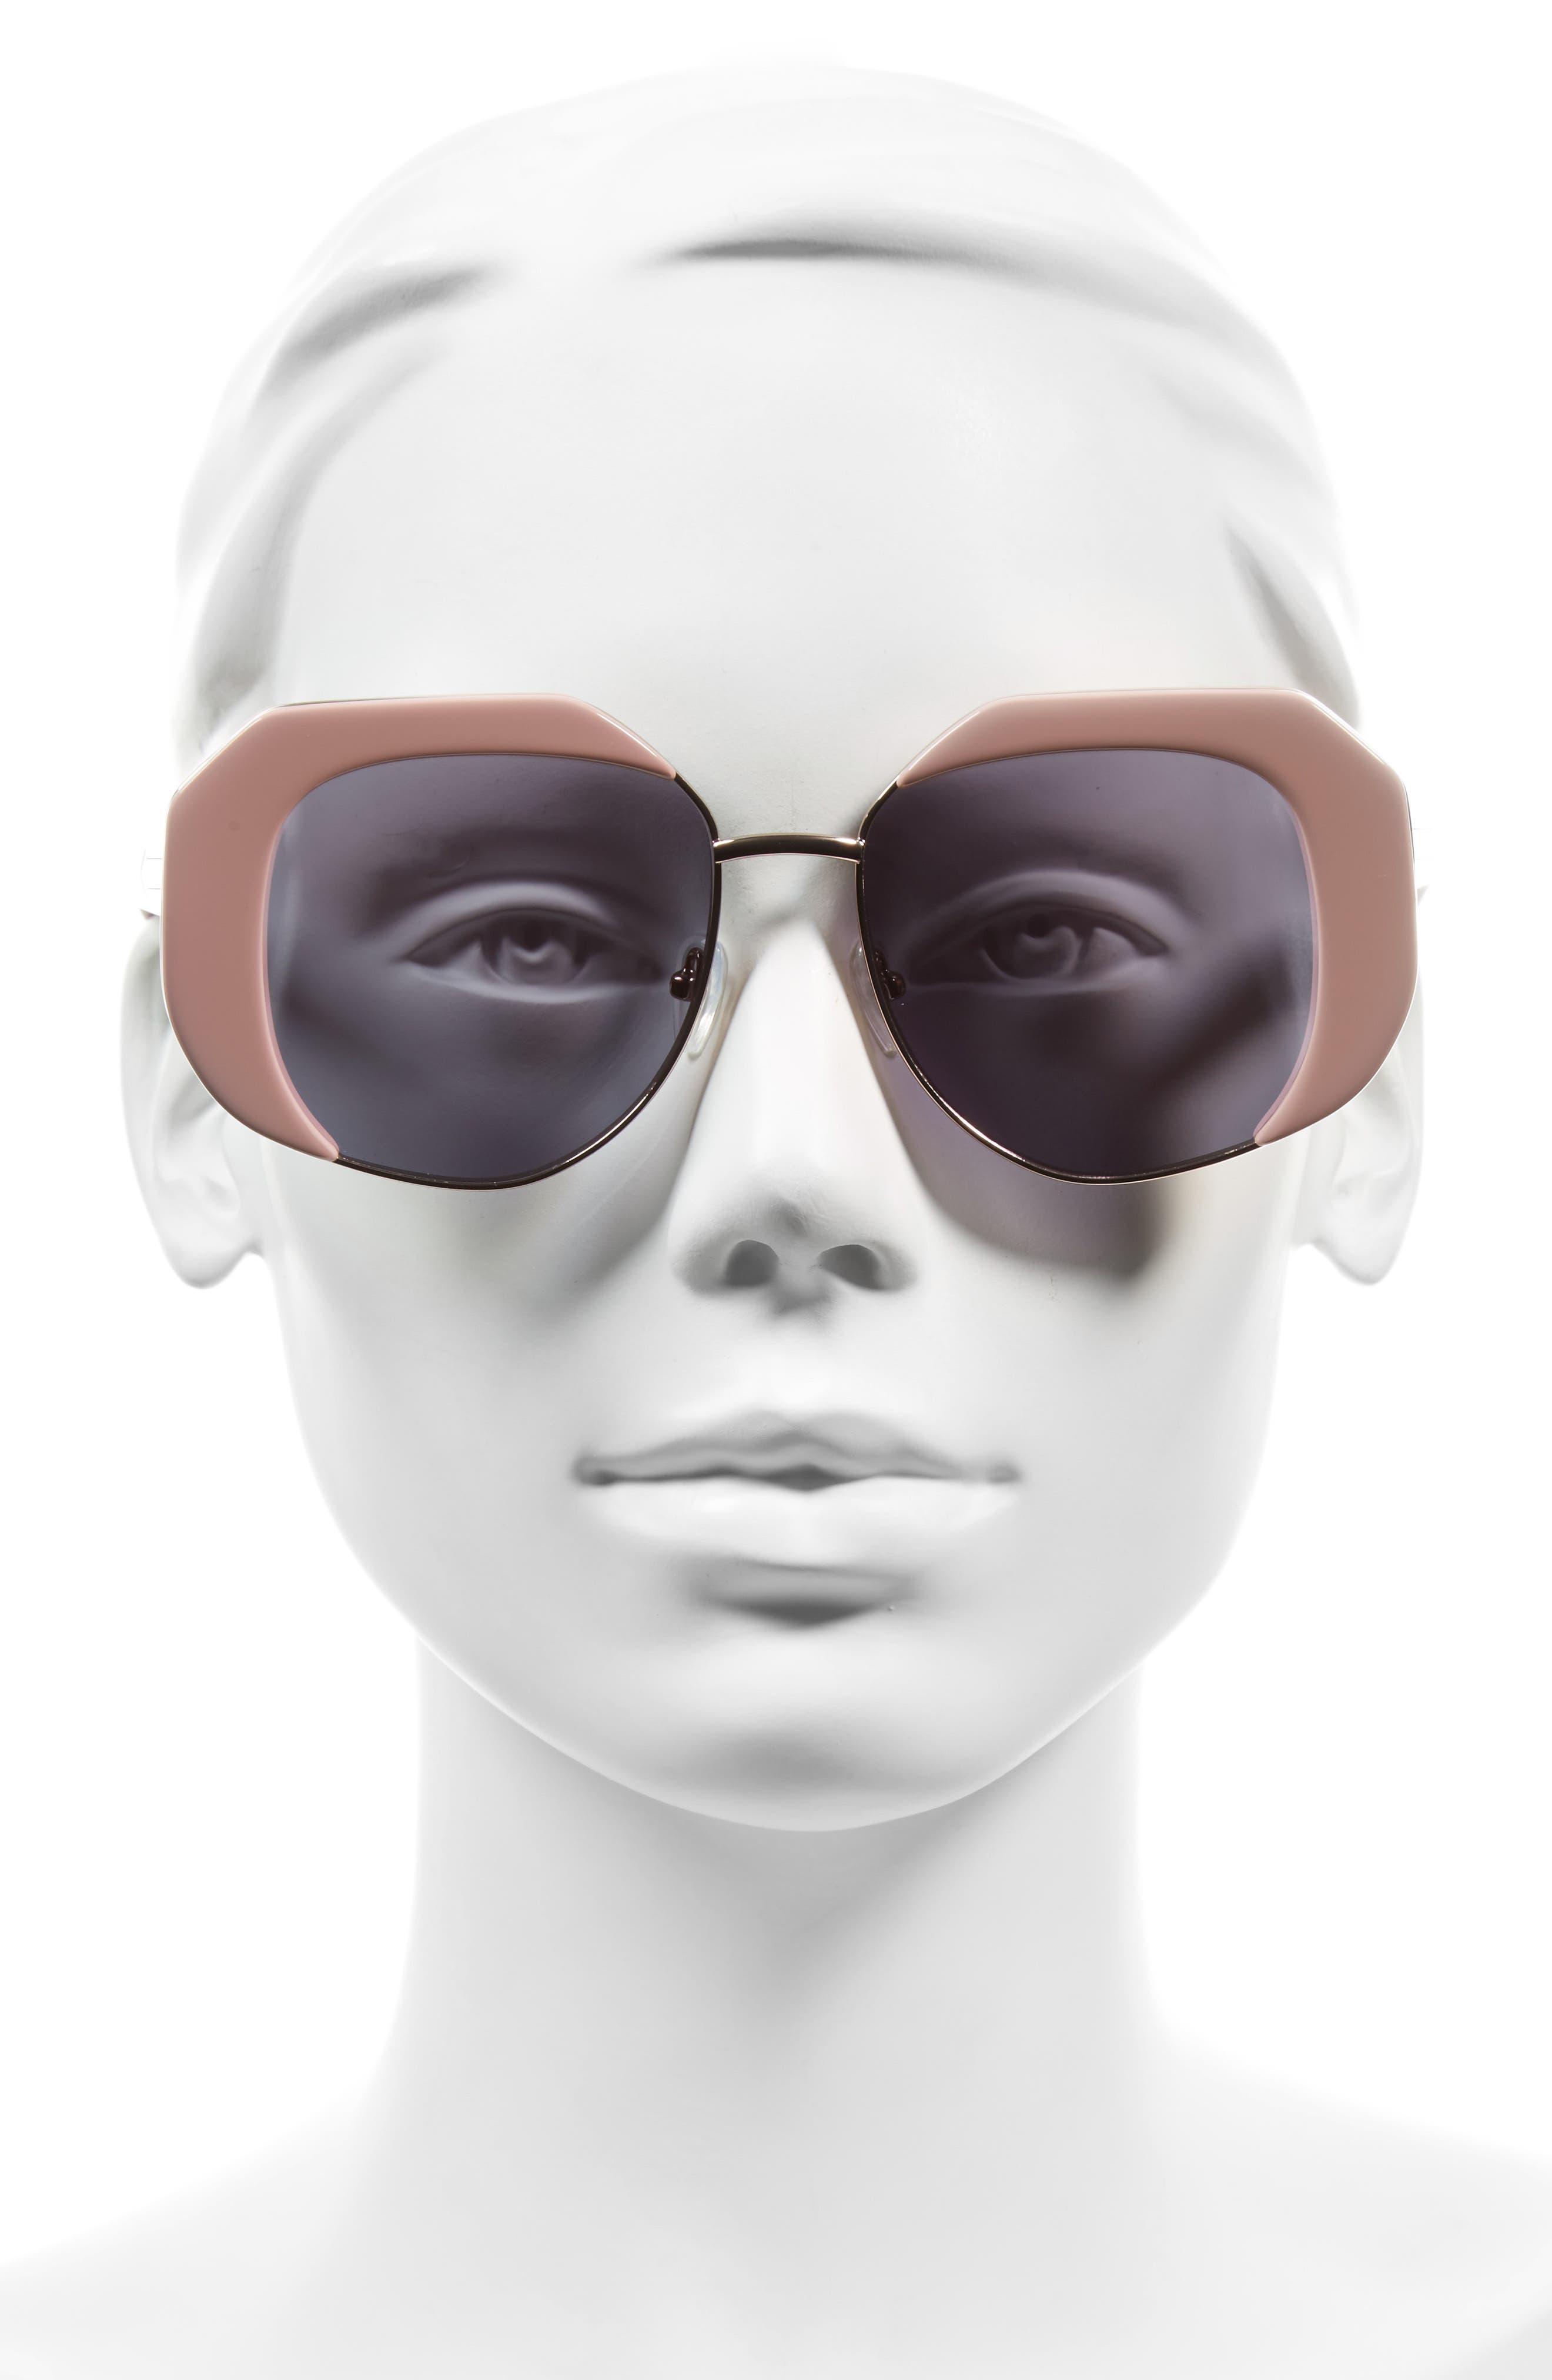 Domingo 52mm Sunglasses,                             Alternate thumbnail 2, color,                             Pink/ Rose Gold